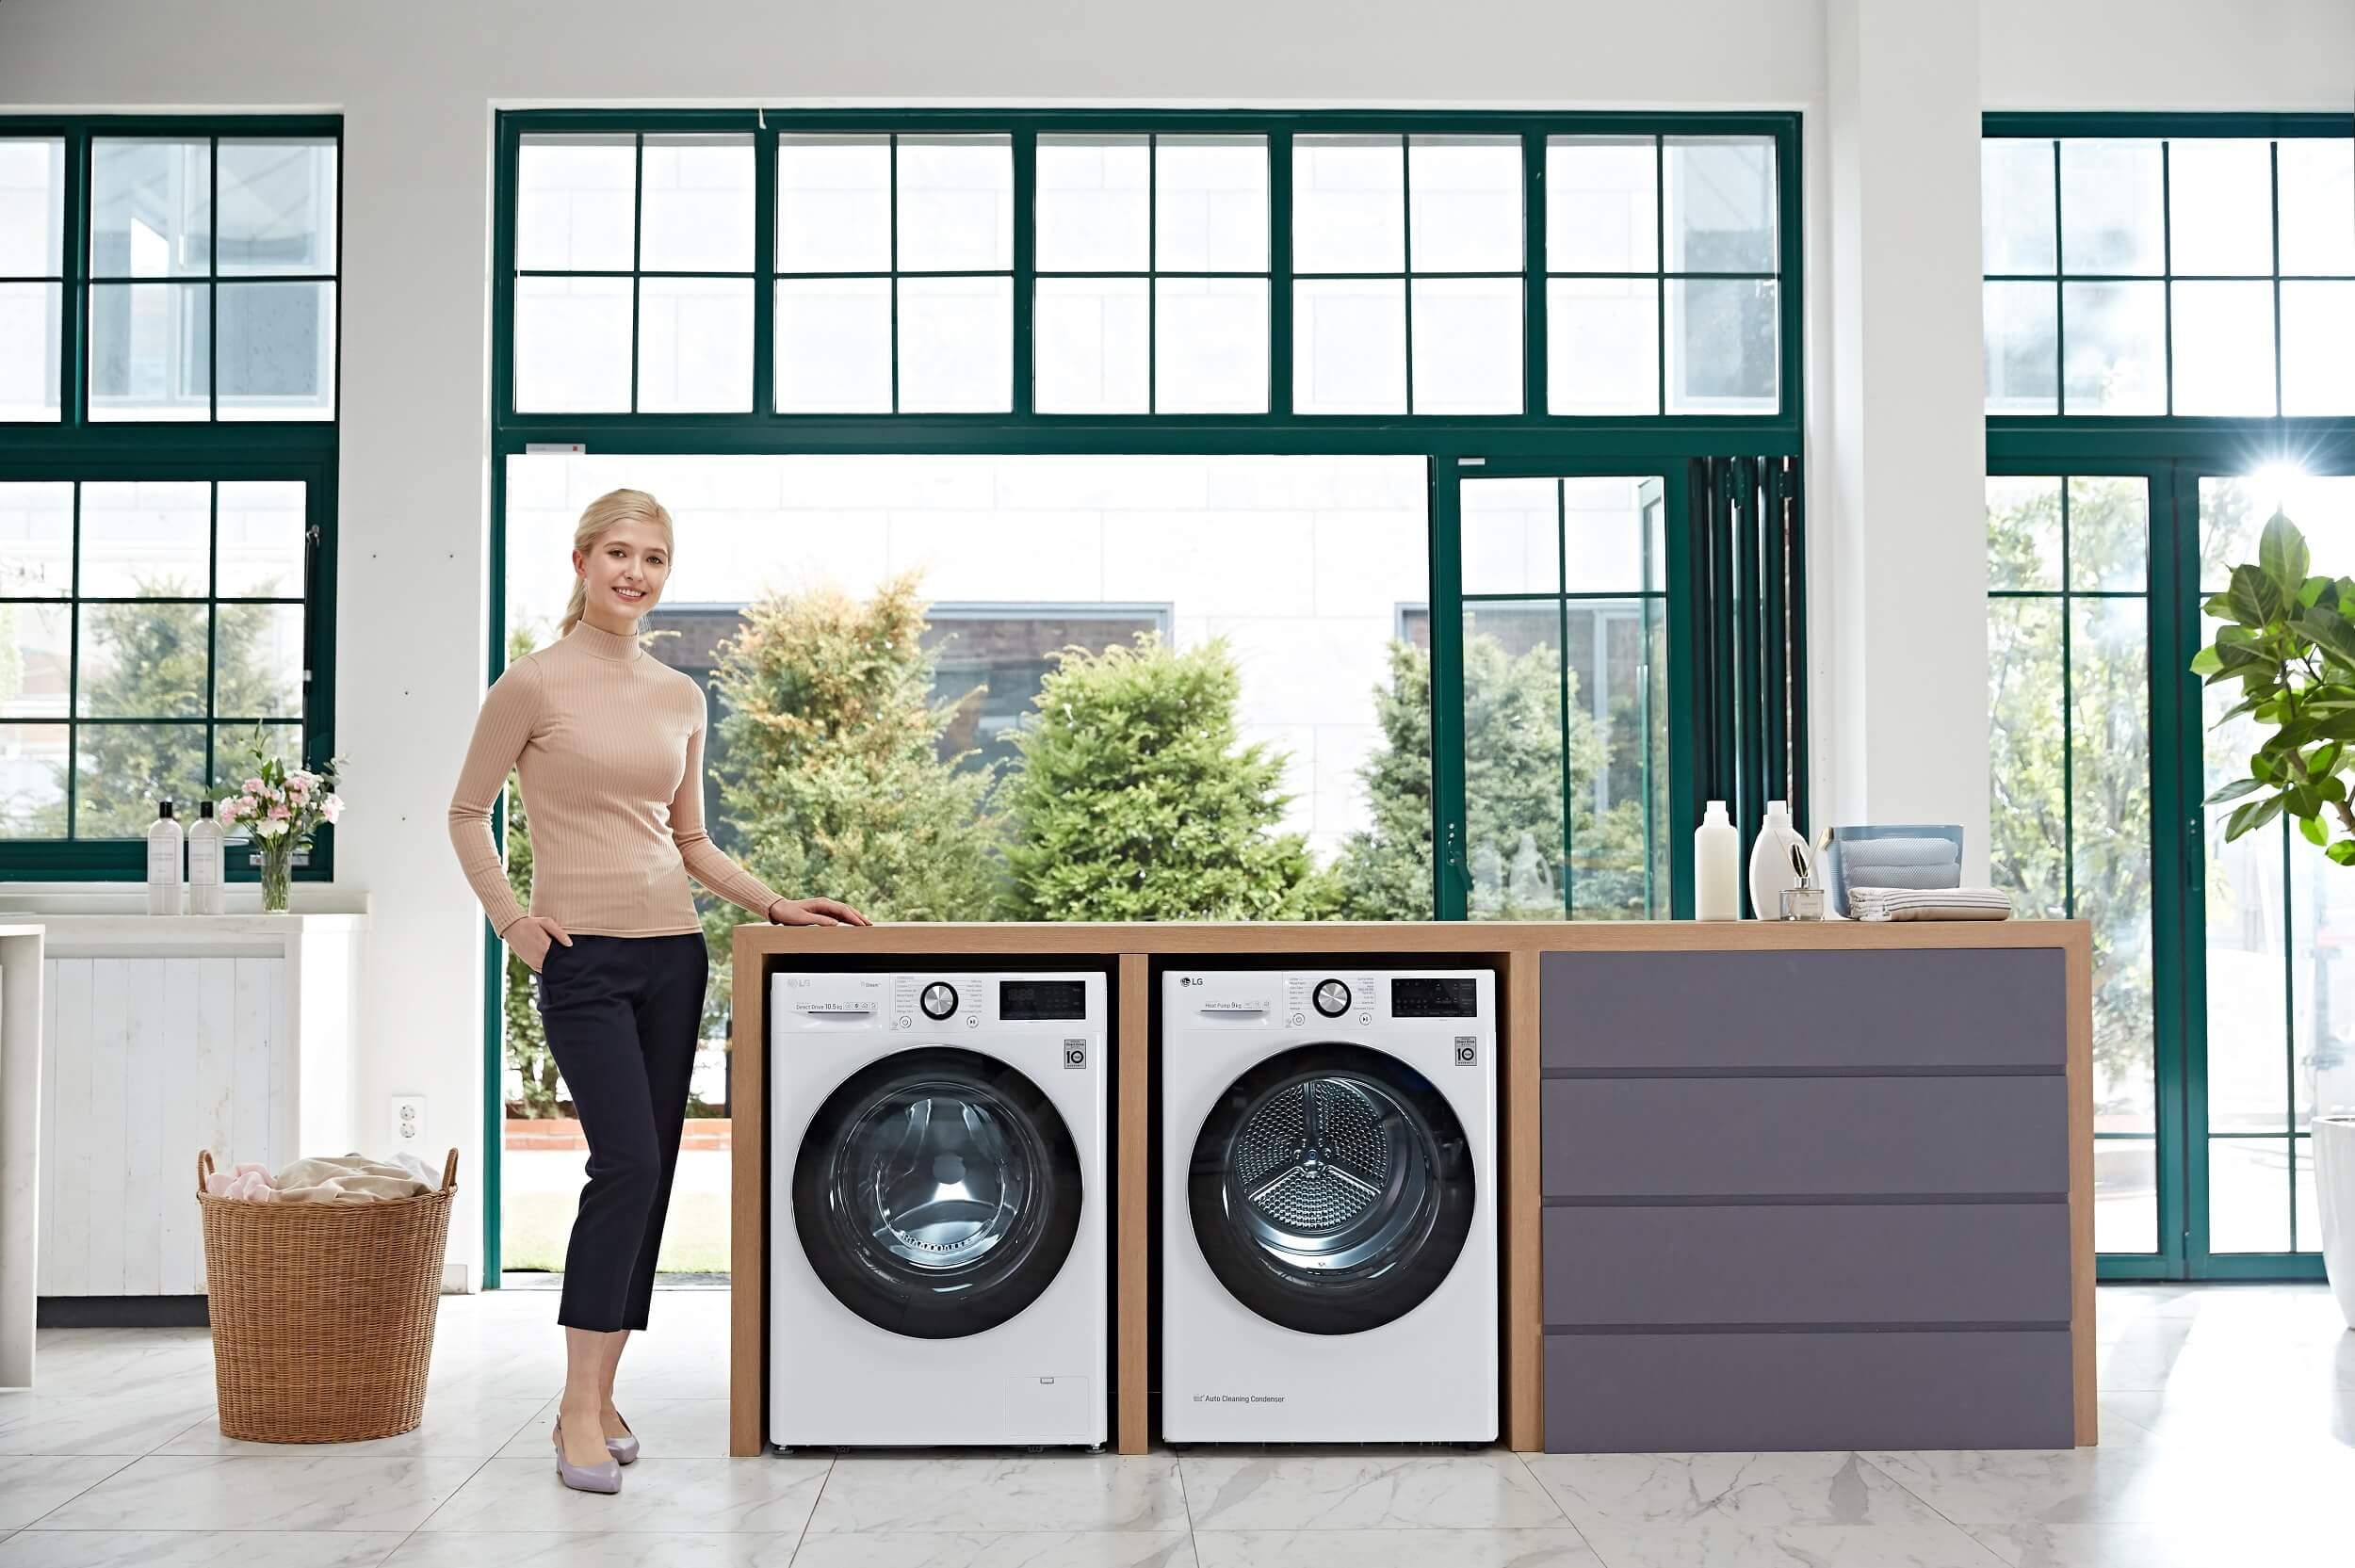 интеллектуальная стиральная машина